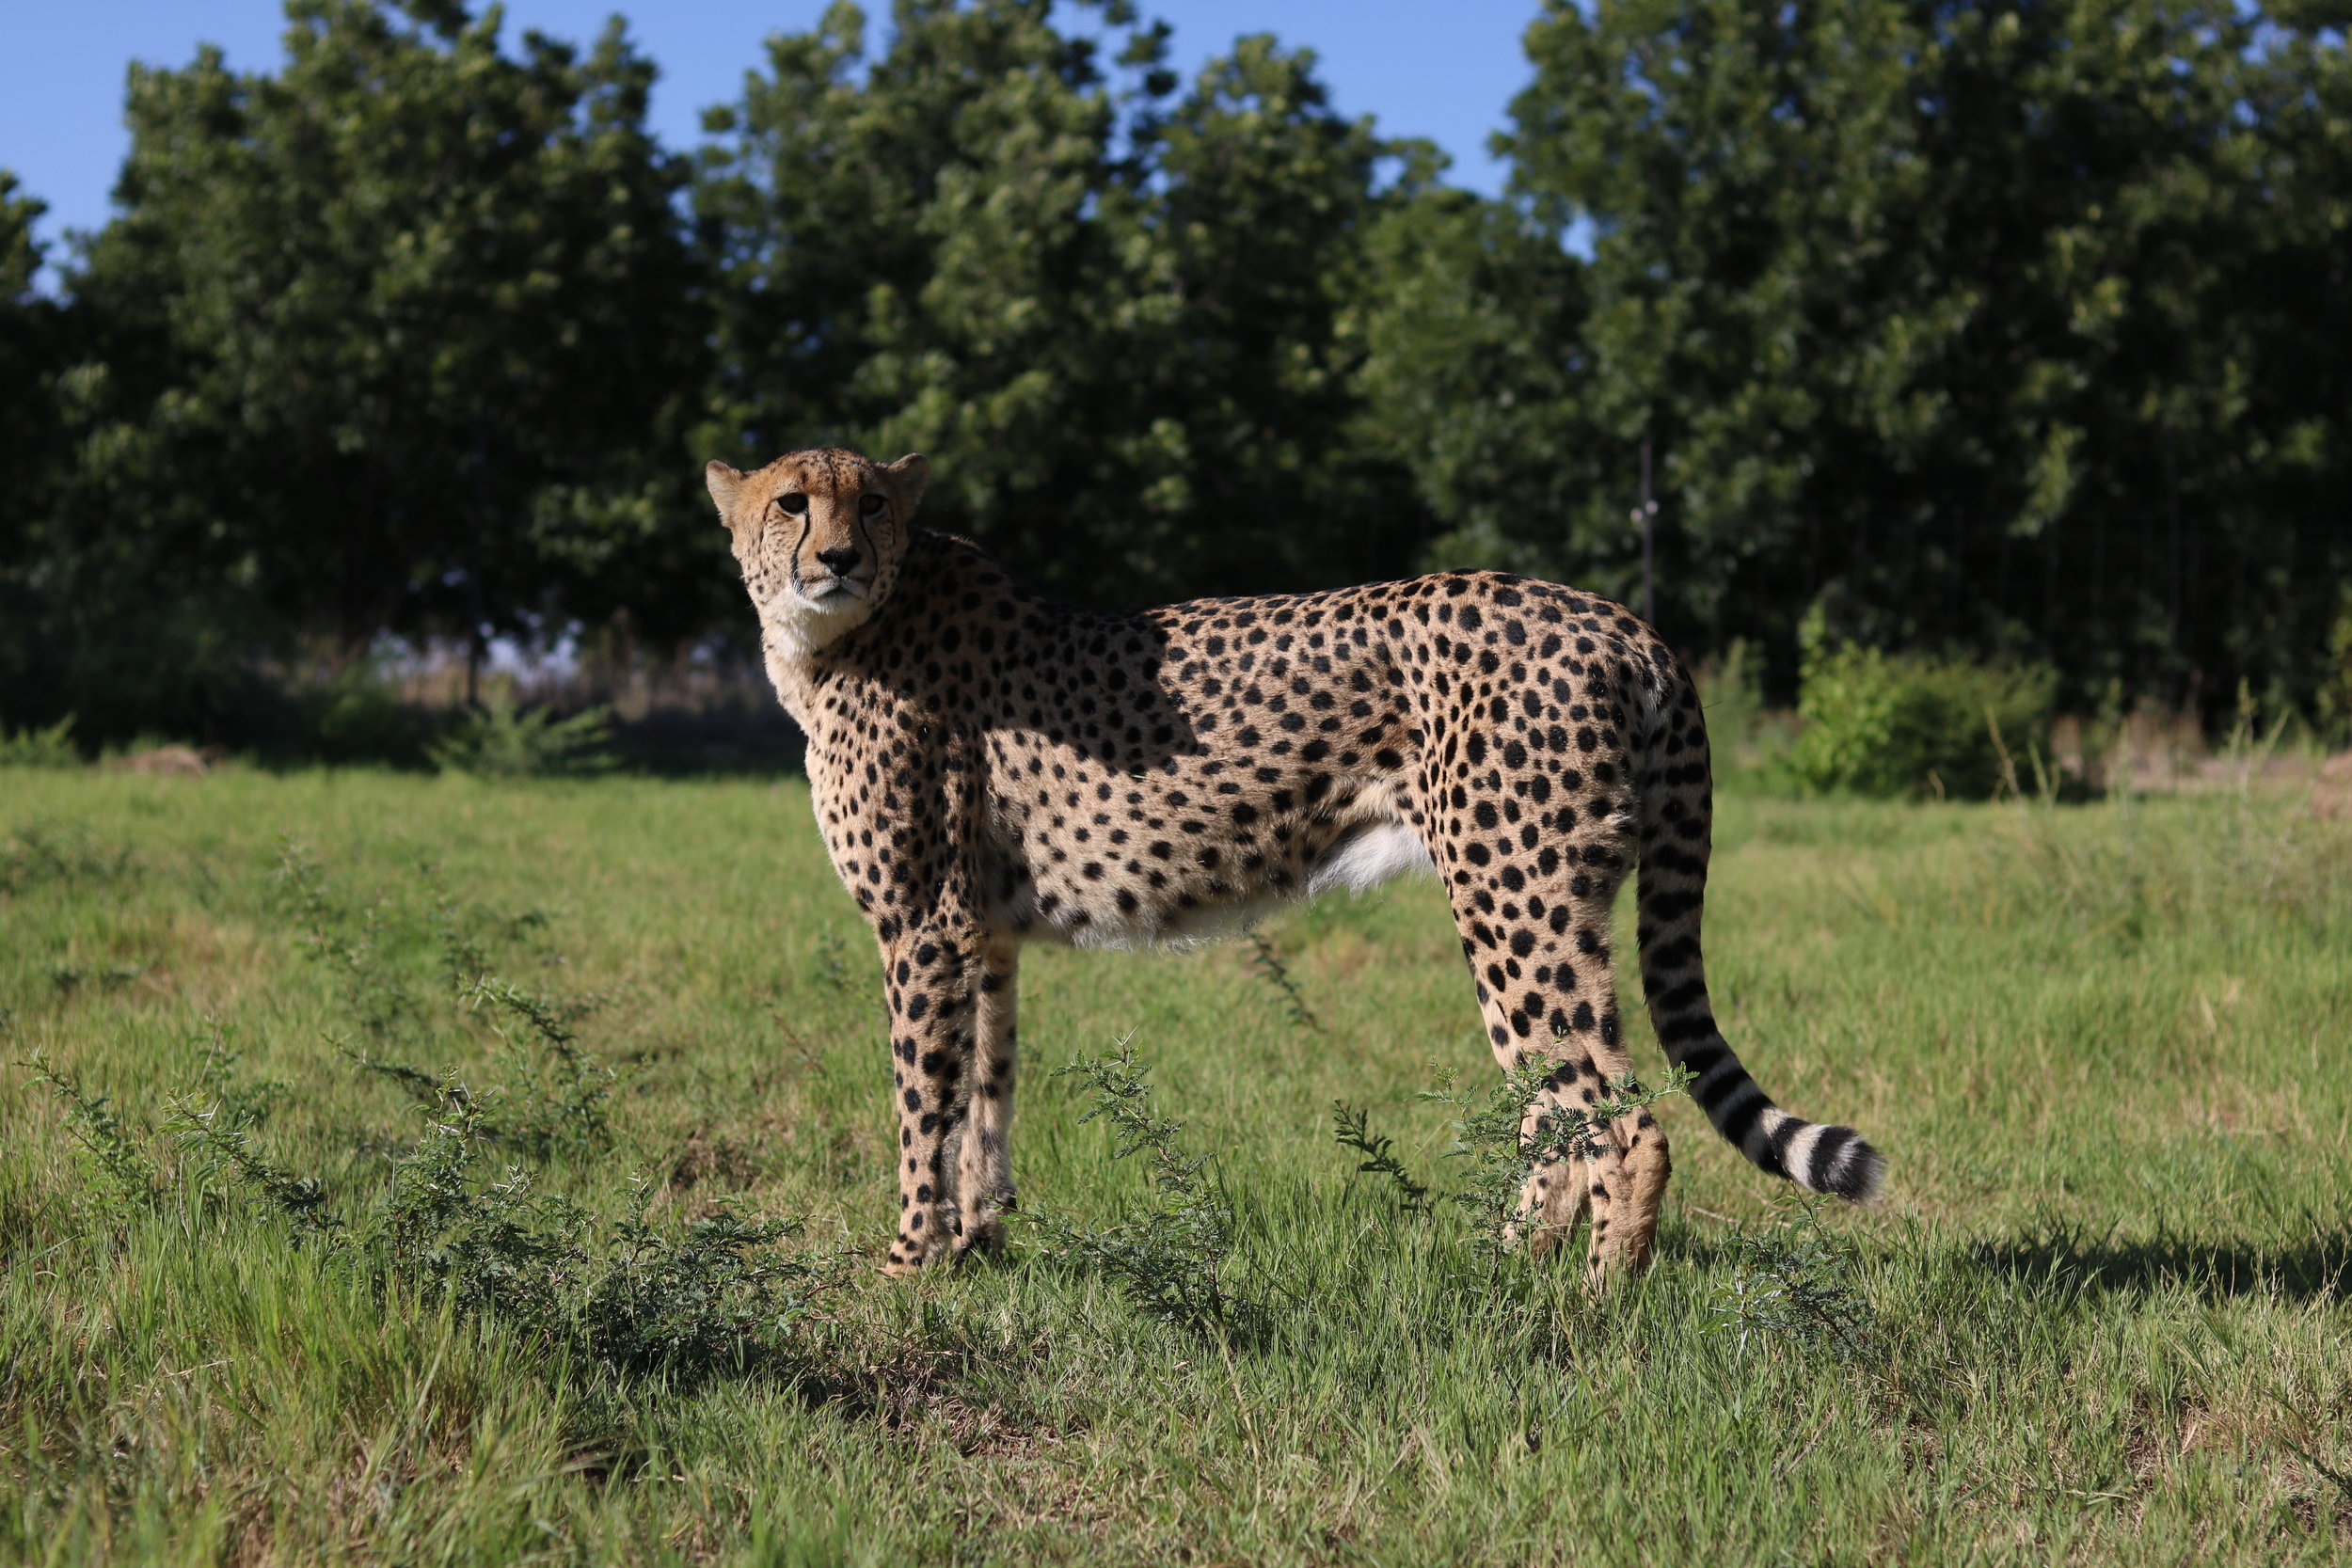 Mbogo Cheetah Centre — Mbogo Game Services